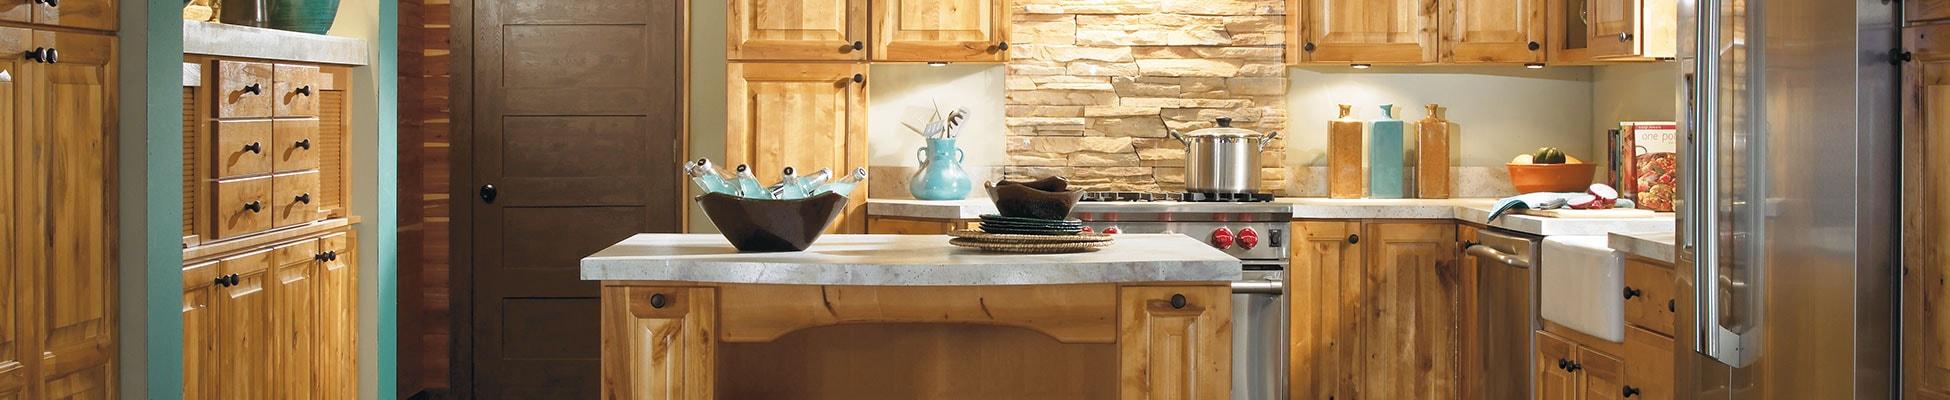 Replacement Windows Kitchens Baths MD DC VA GA